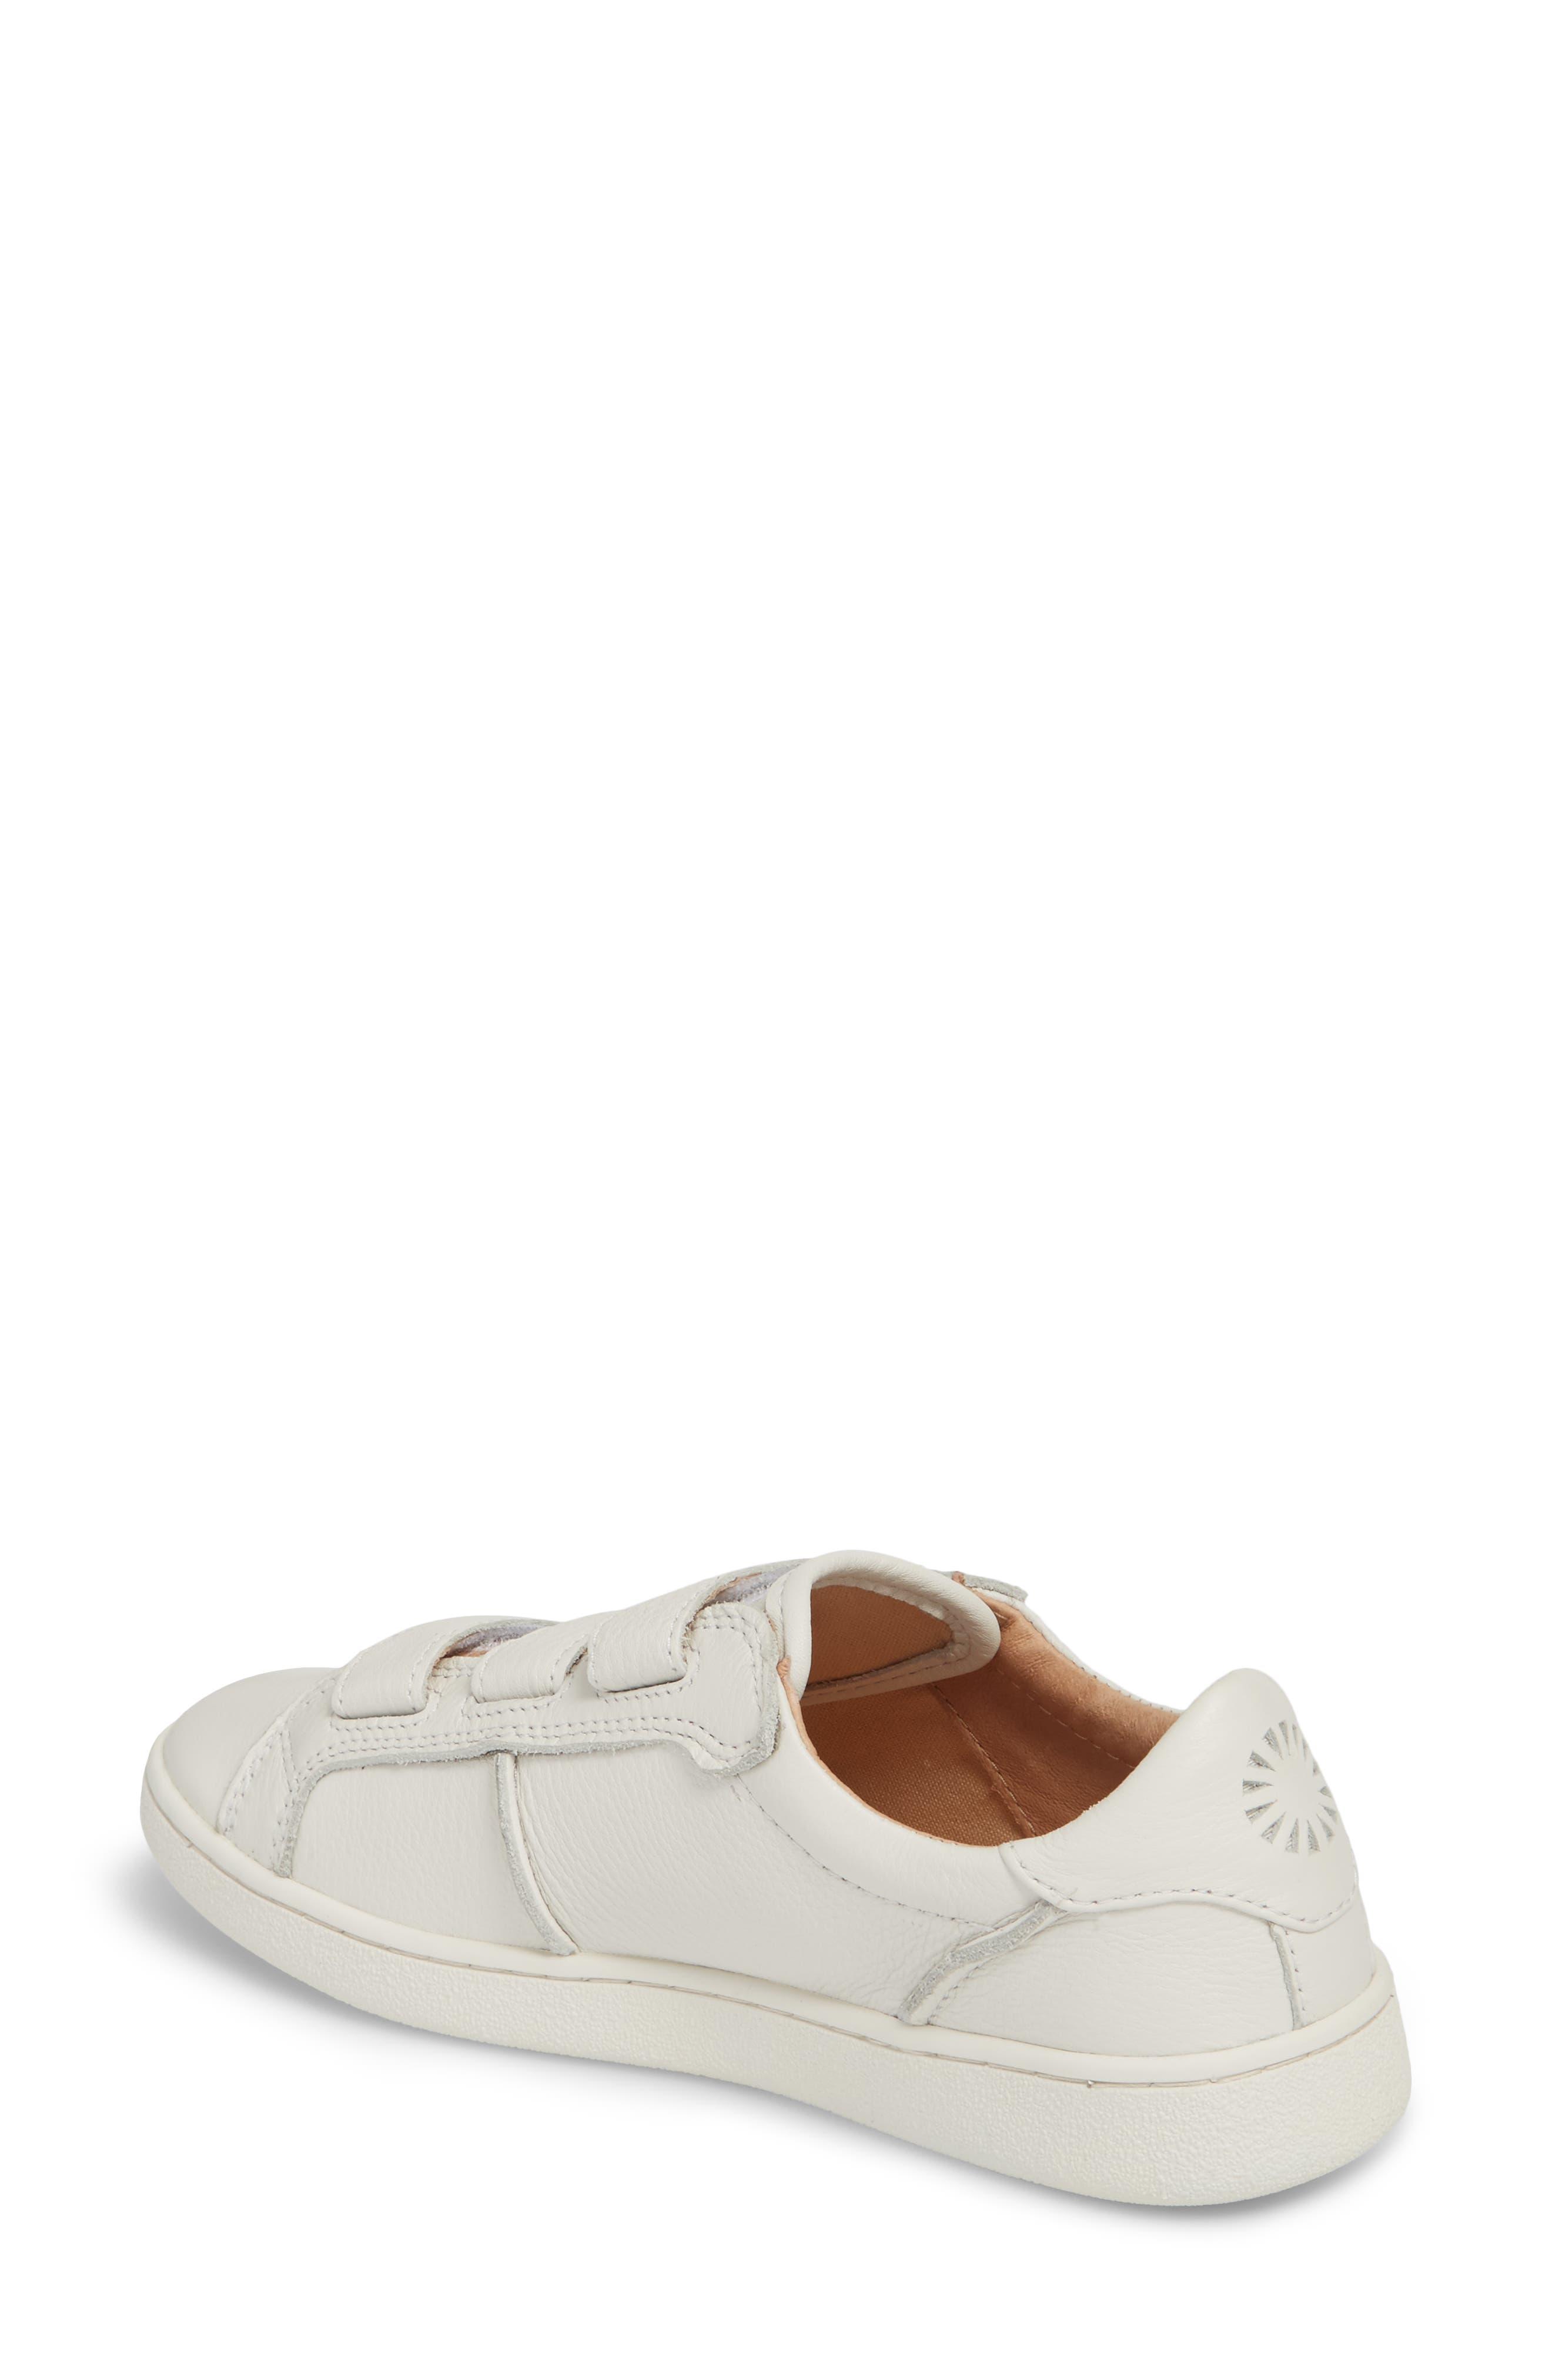 Alix Sneaker,                             Alternate thumbnail 2, color,                             WHITE LEATHER